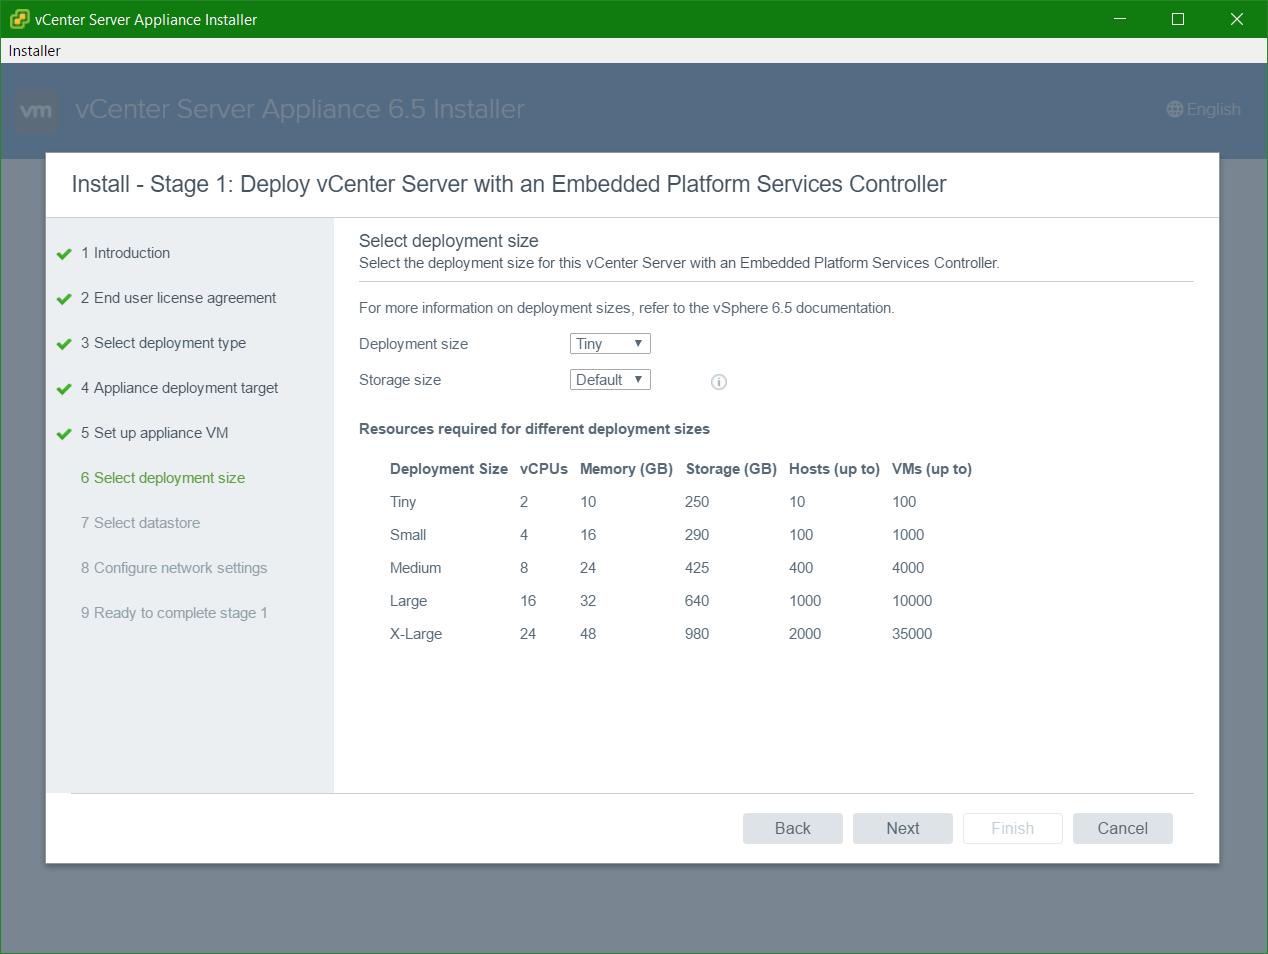 domalab.com VCSA install deployment type